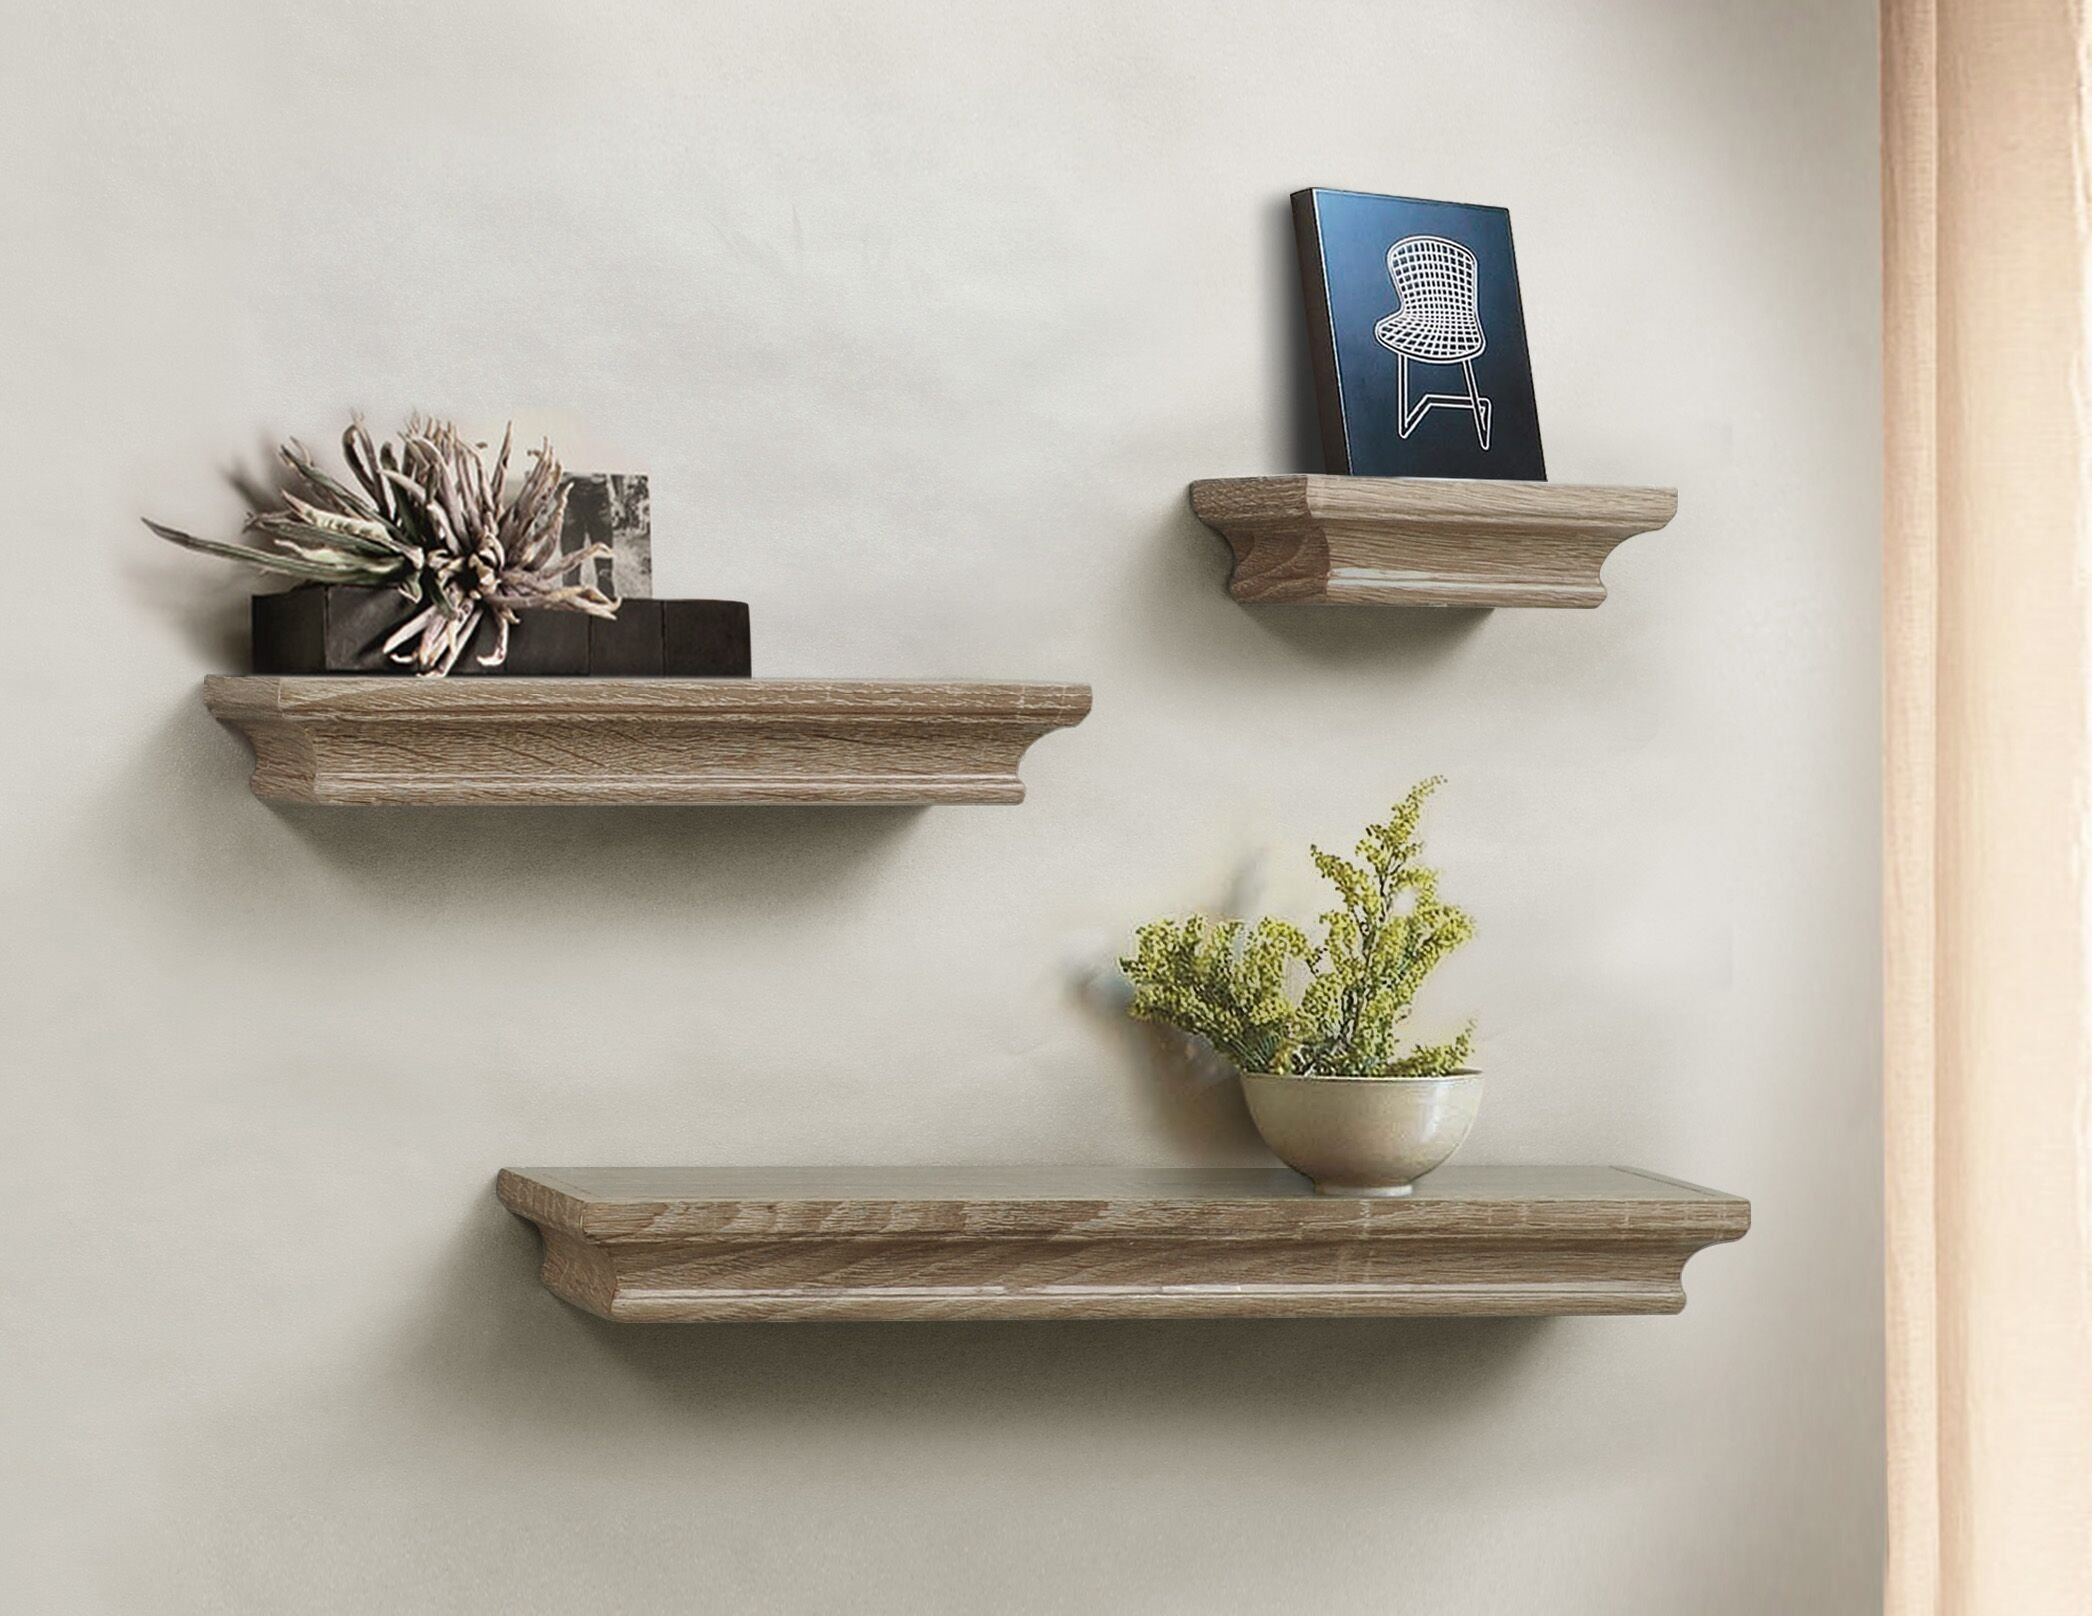 ahdecor floating shelves grey wash ledge wall shelf for home decor with 4 deep set of 3 pcs